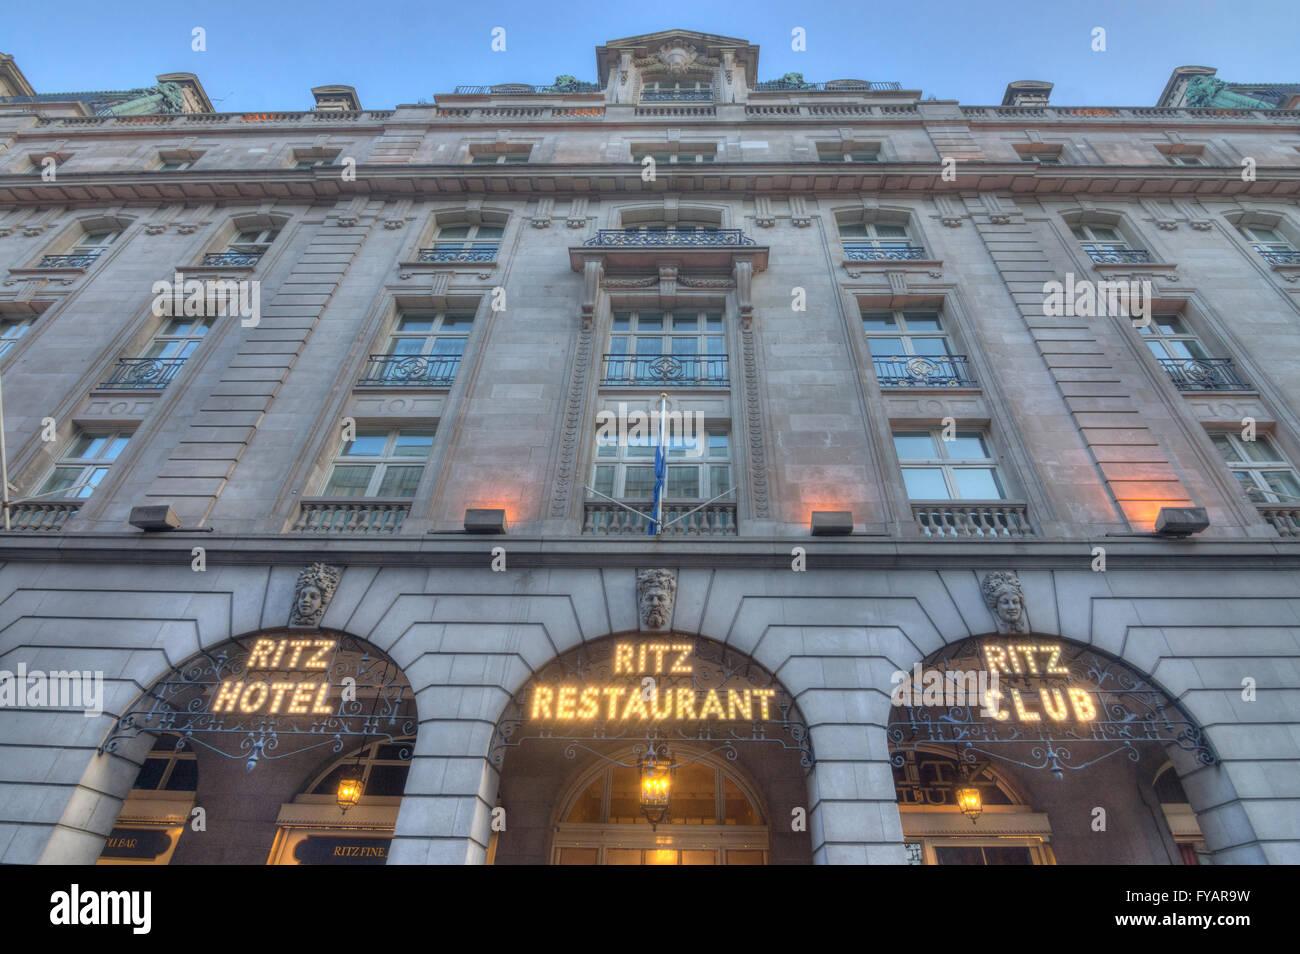 Ritz Hotel  London.  5 star hotel - Stock Image